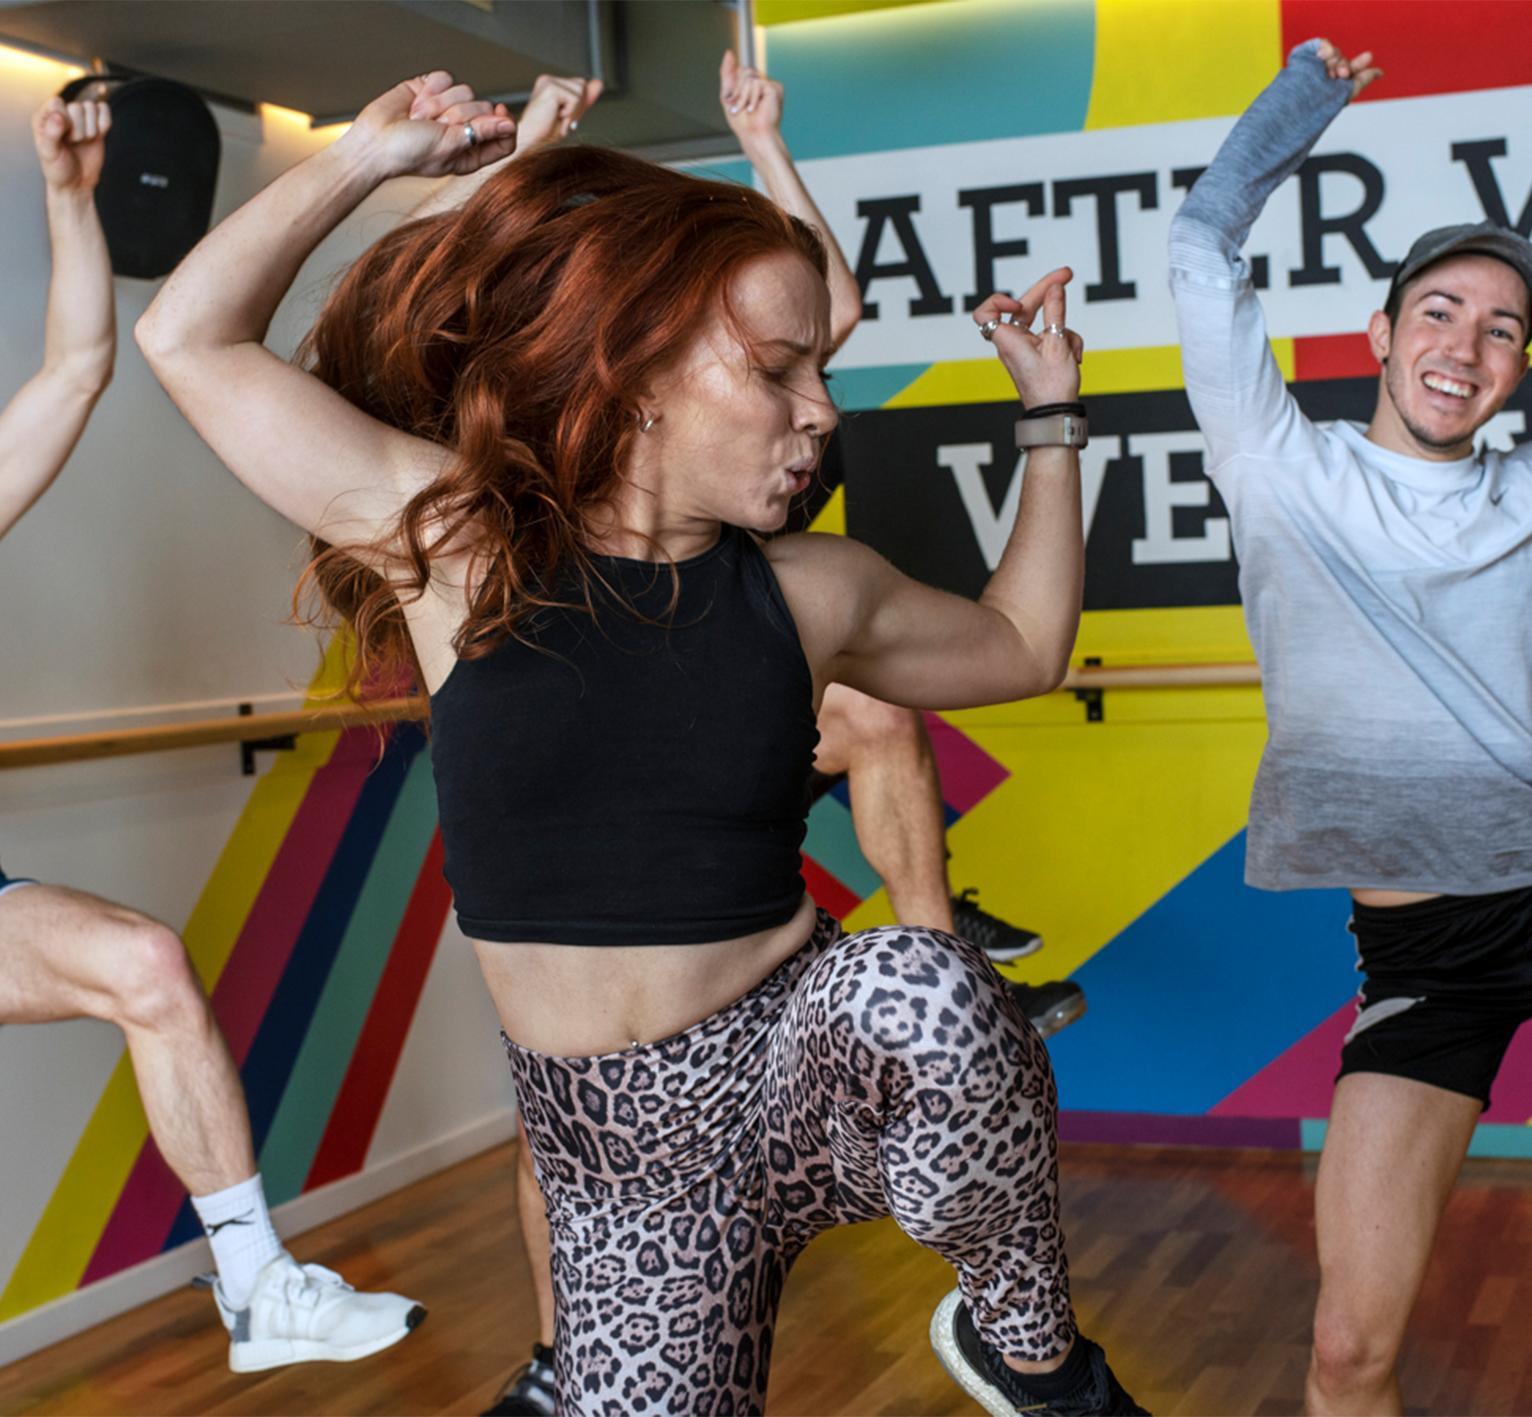 Dance Cardio Fitness Classes Frame